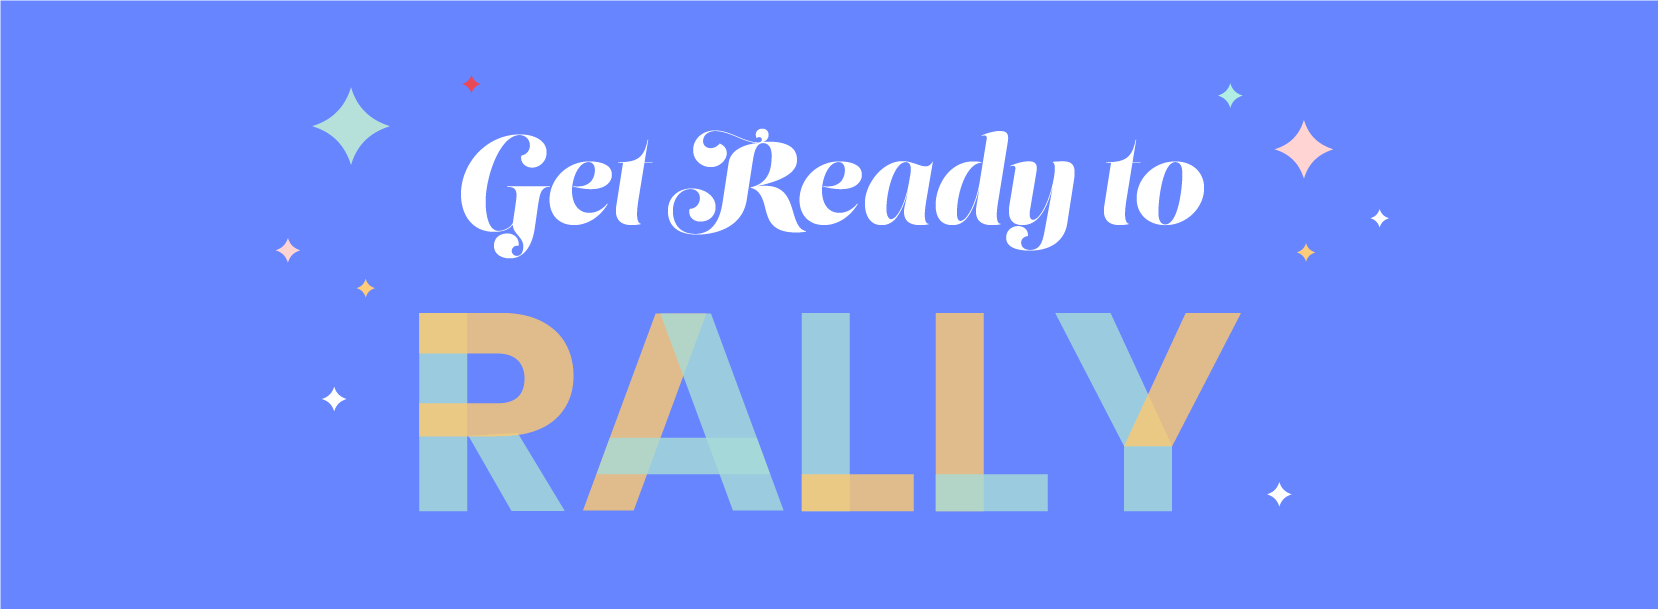 Three Reasons to RALLY